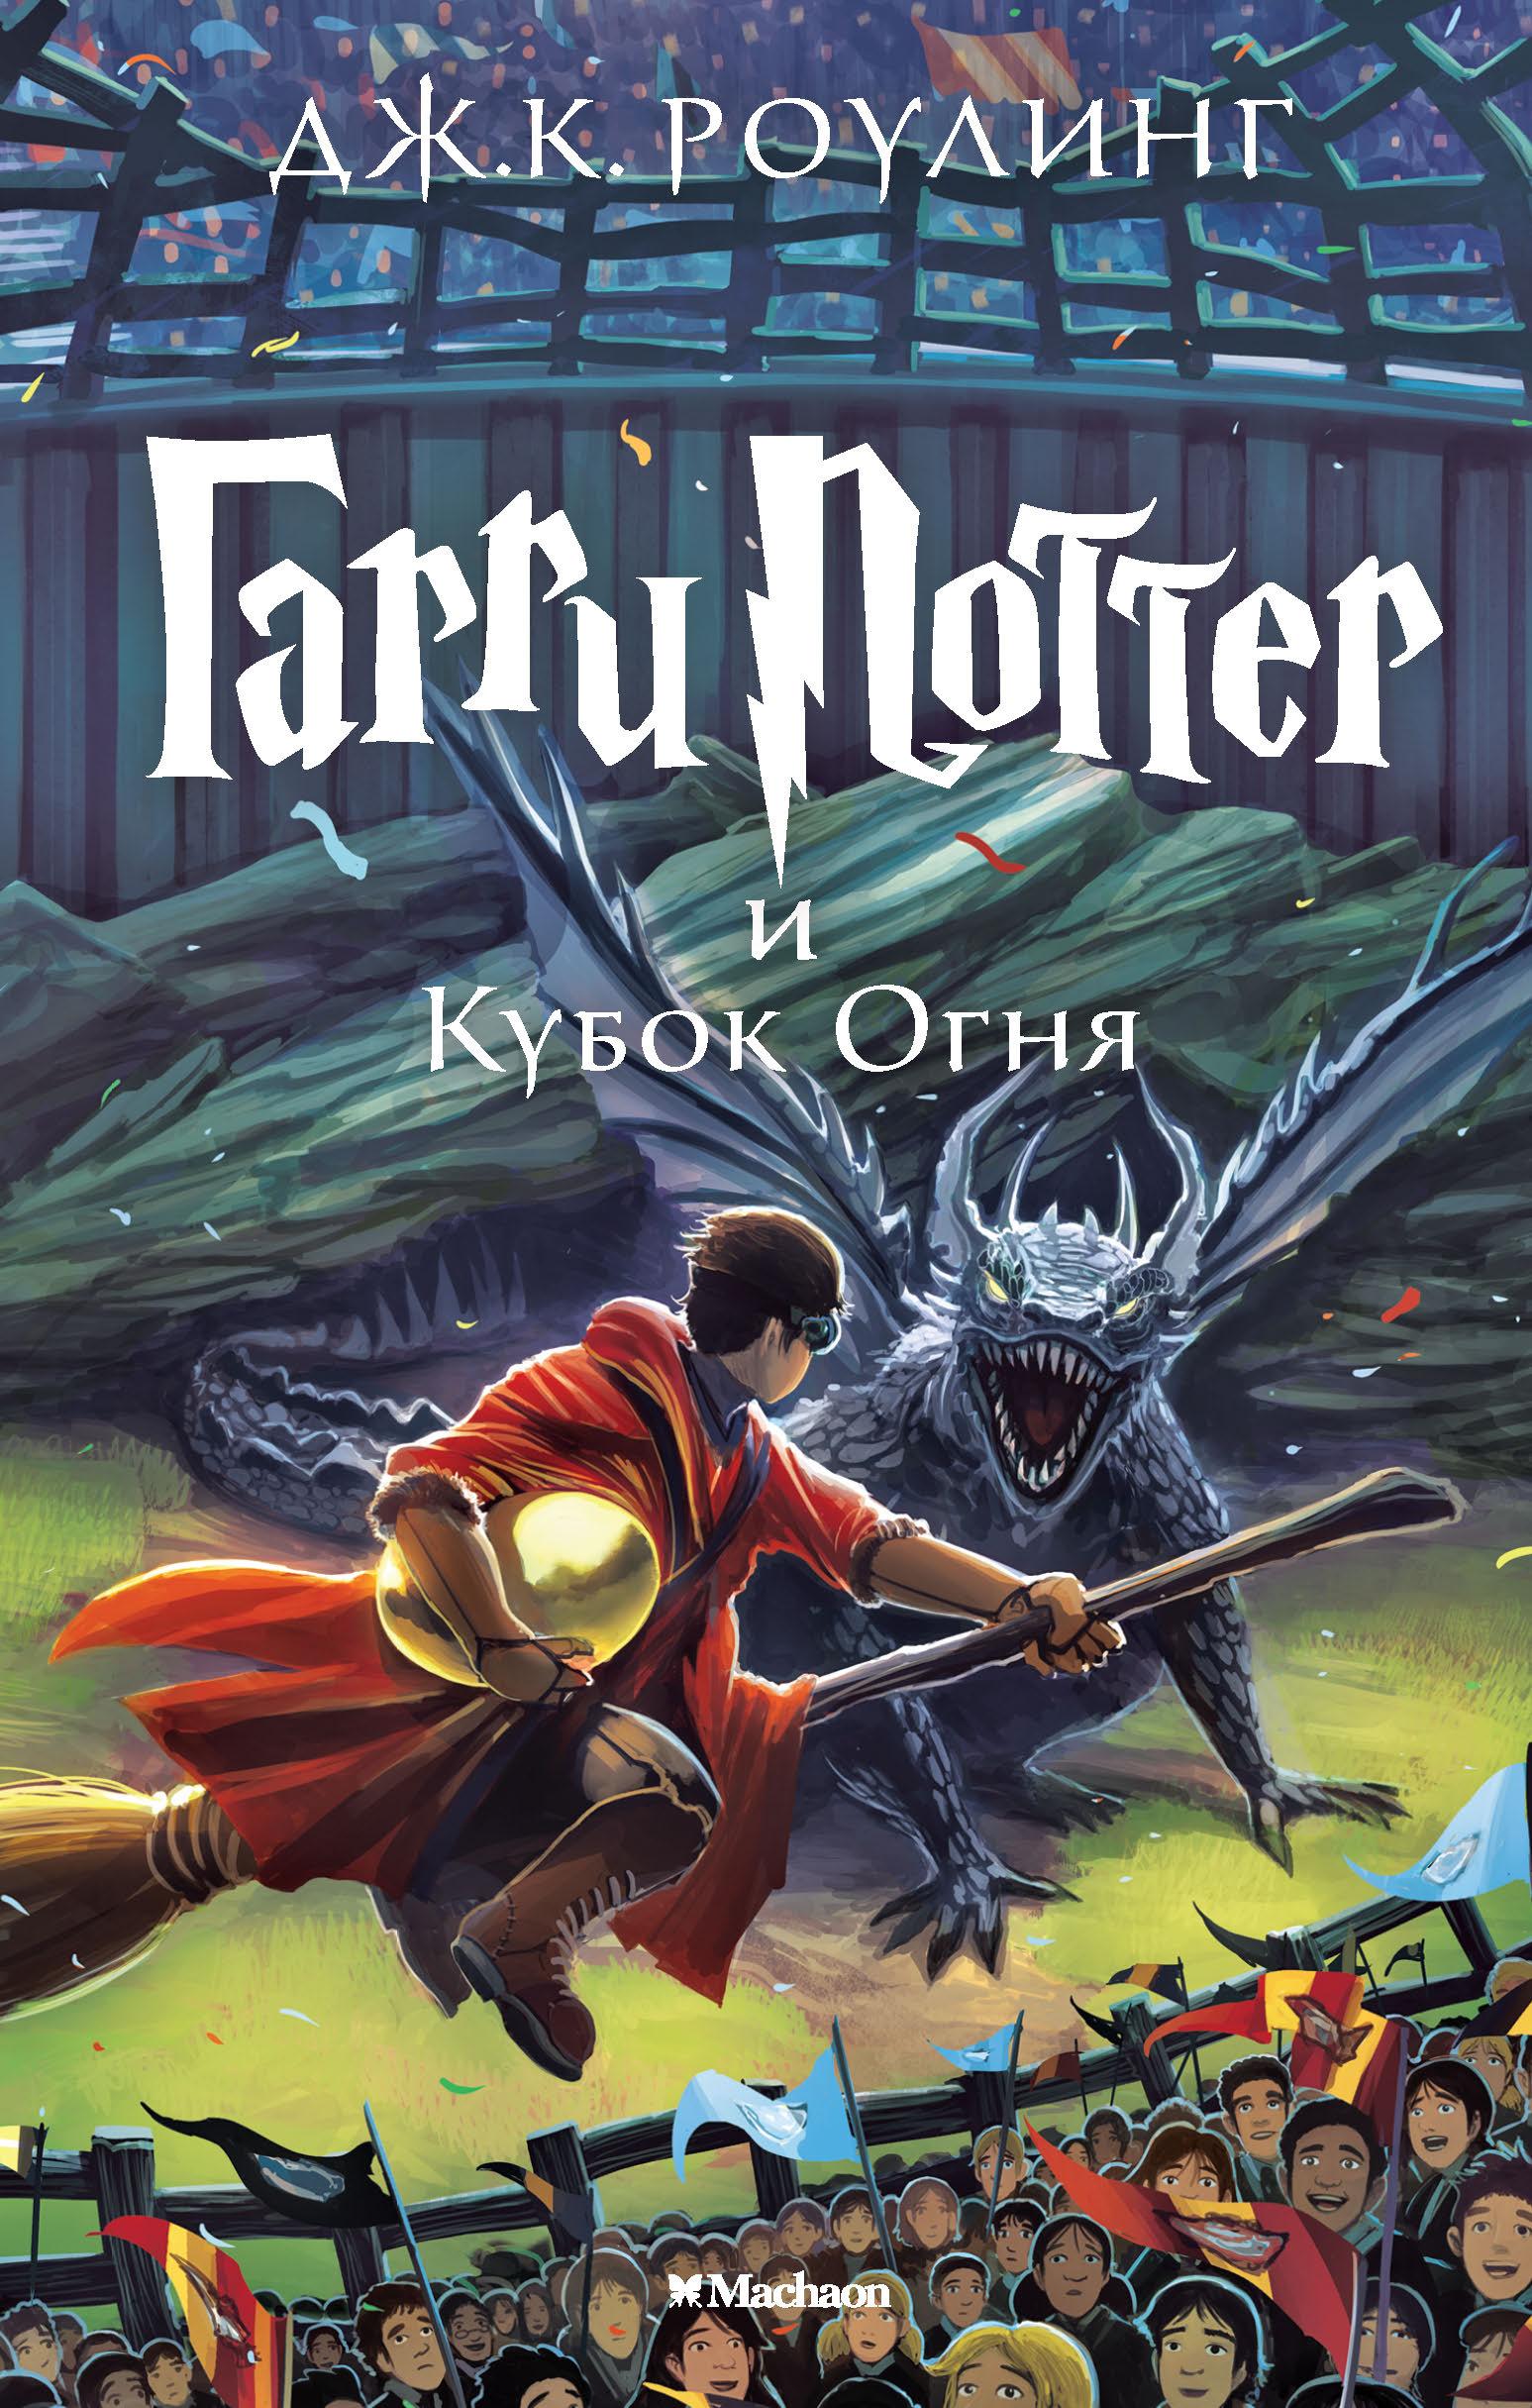 Книга «Гарри Поттер и Кубок Огня. Кн.4» Роулинг Джоан ...